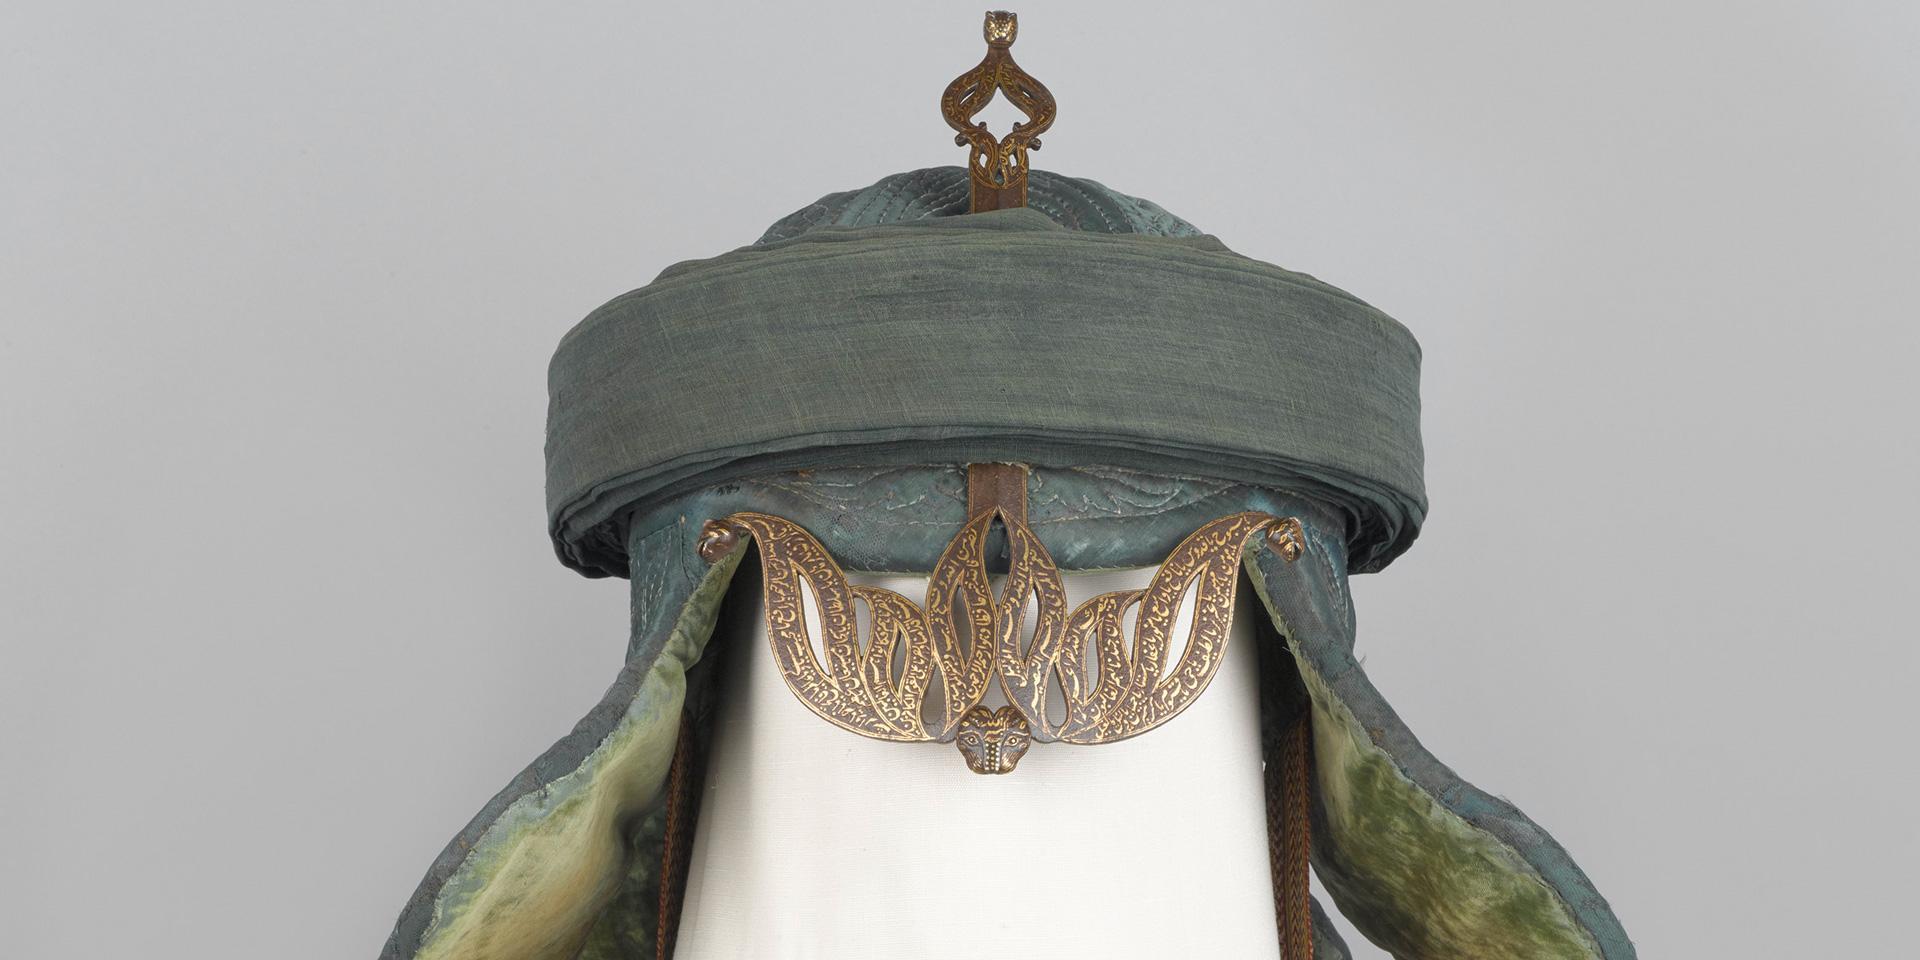 Tıpu Sultan's war turban, c1799